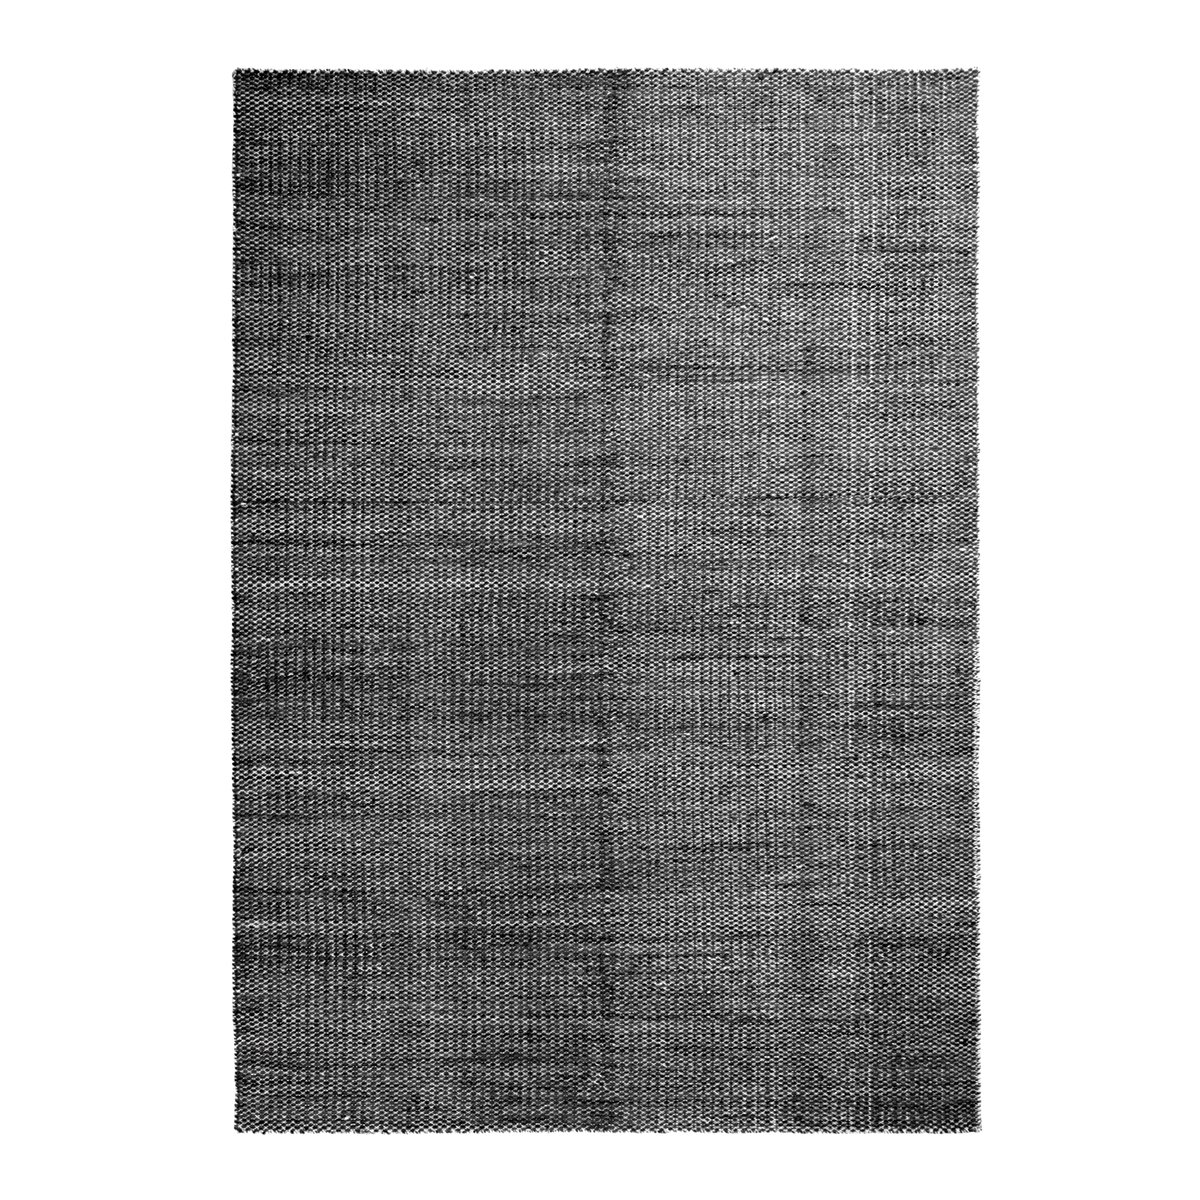 HAY Moir� Vloerkleed Zwart - l. 200 x b.140 cm.